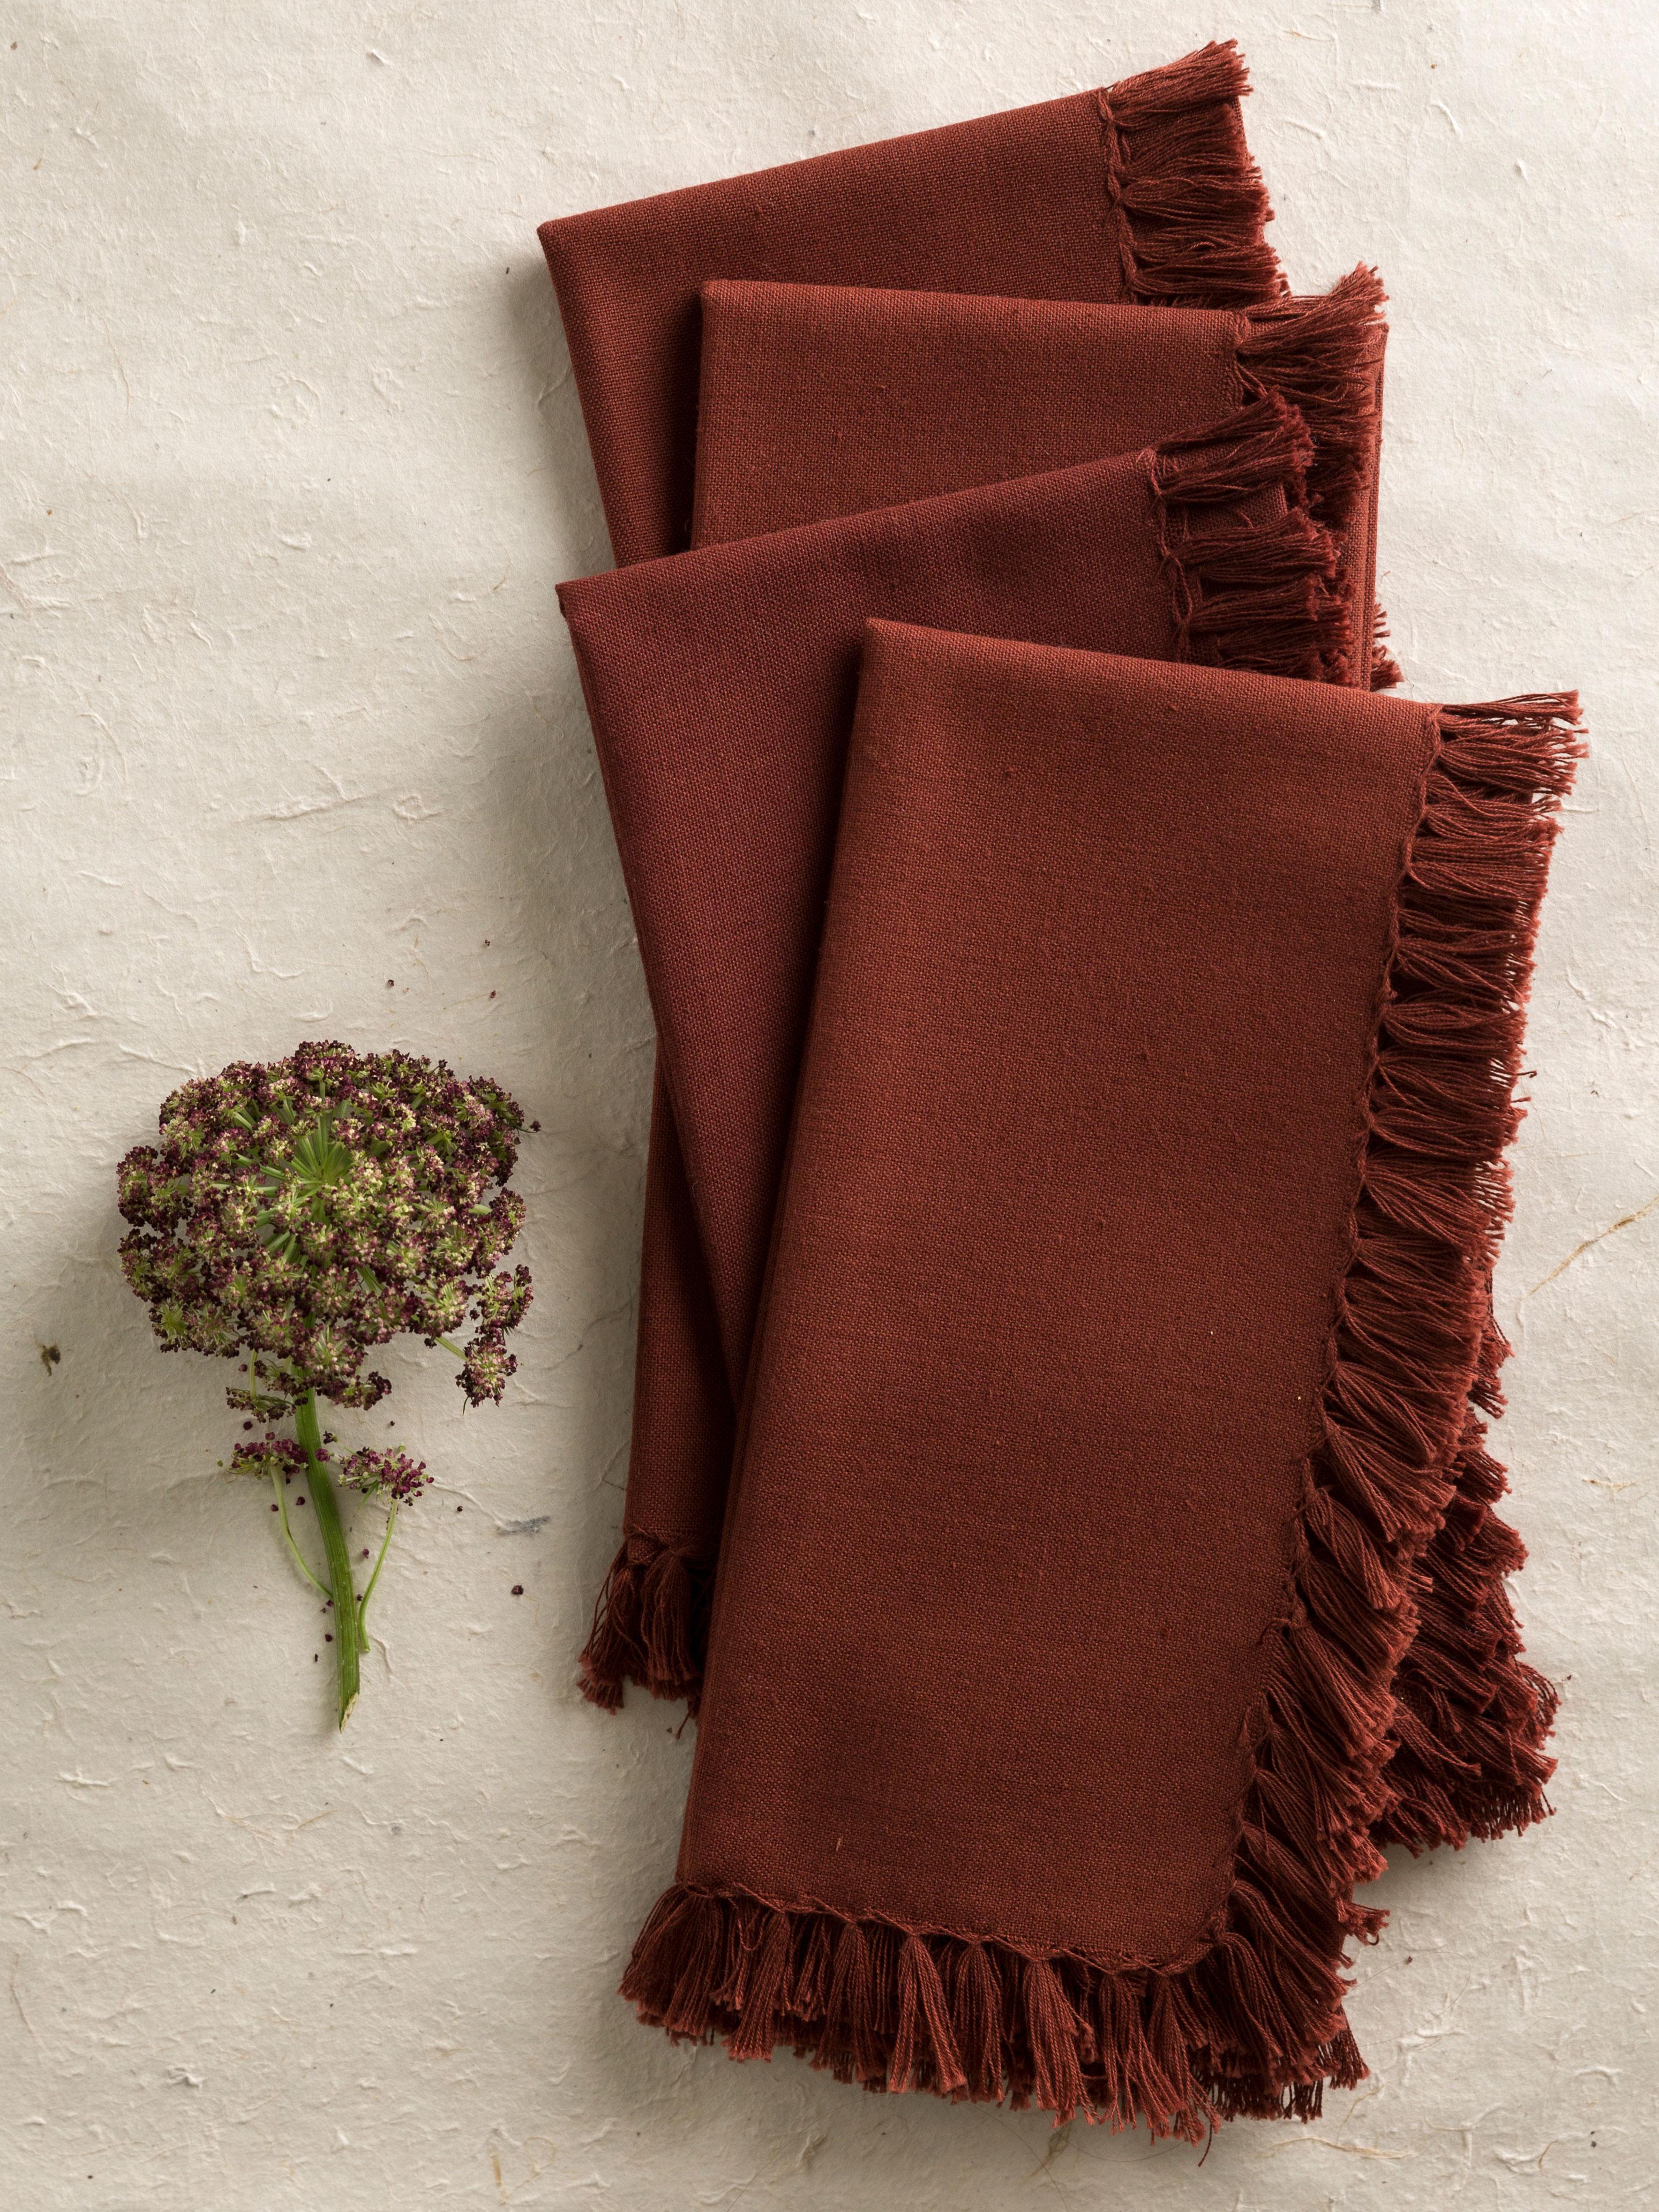 Essential Napkin Set of 4 - Chocolate